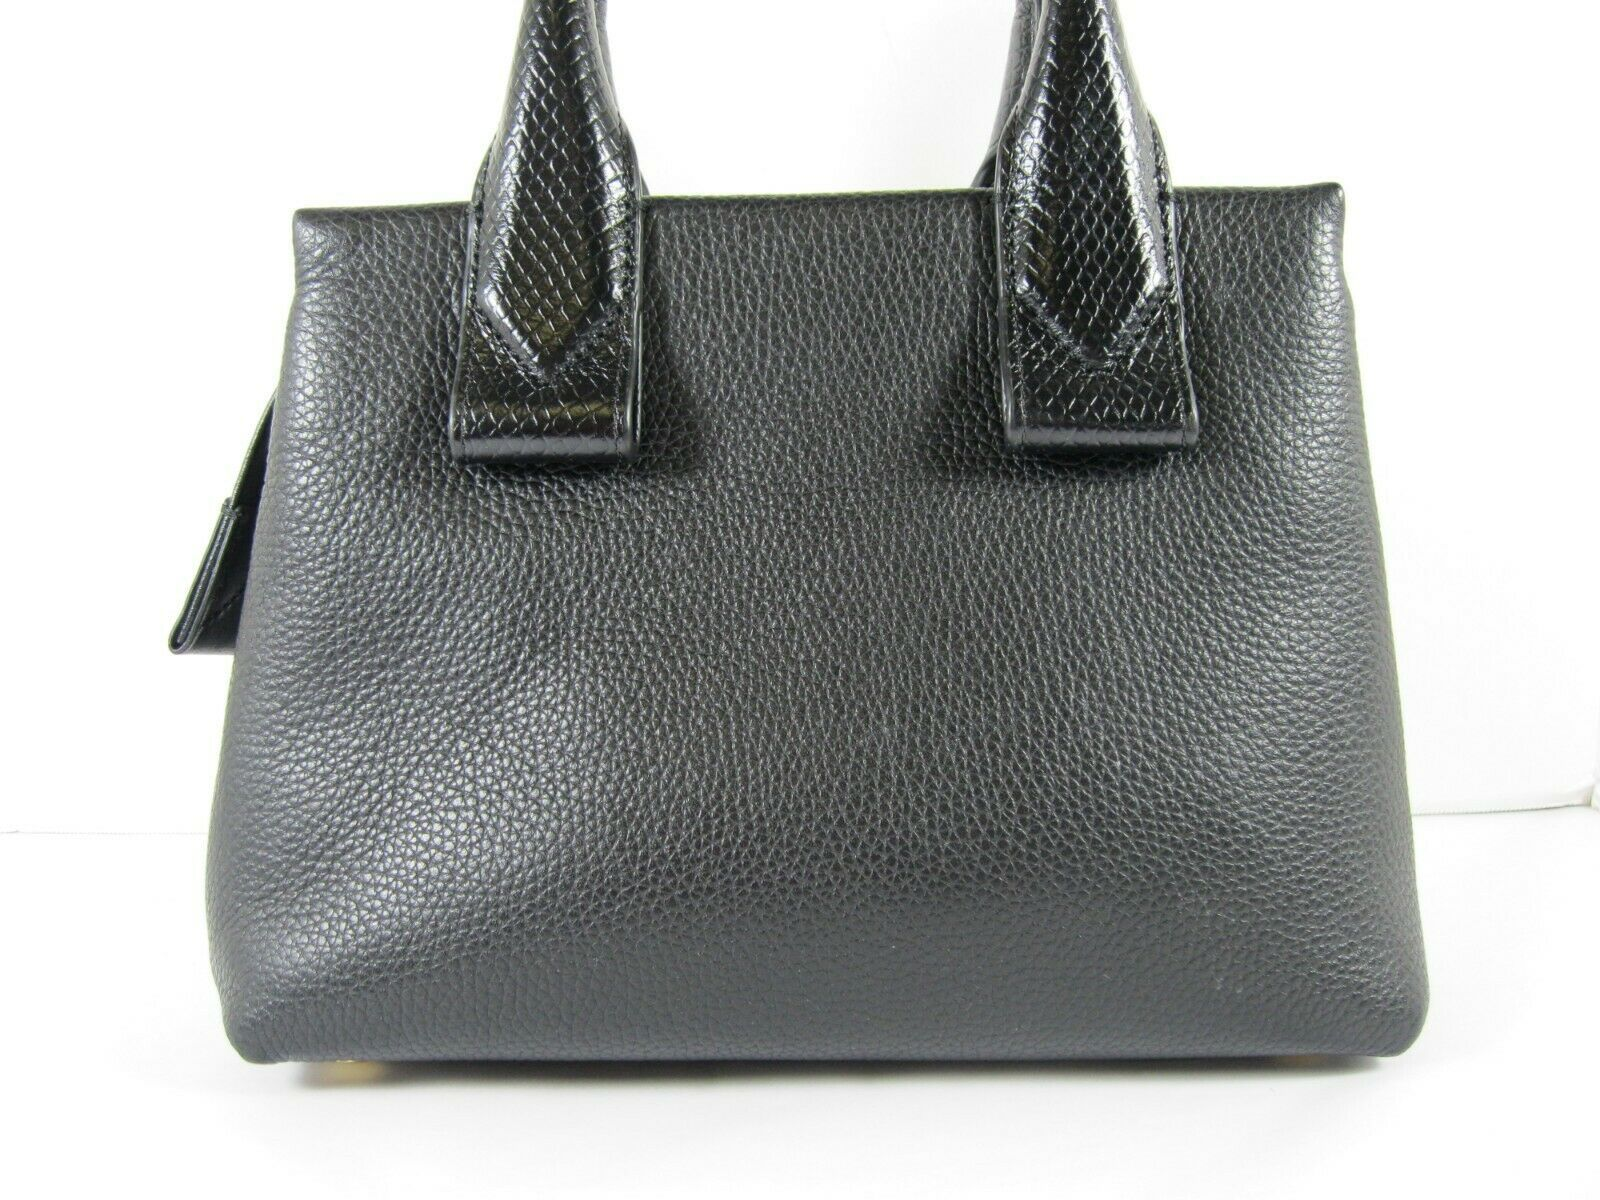 Michael Kors NEW $328 Black Leather Crossbody Messenger Hand Bag Pebbled Gold X